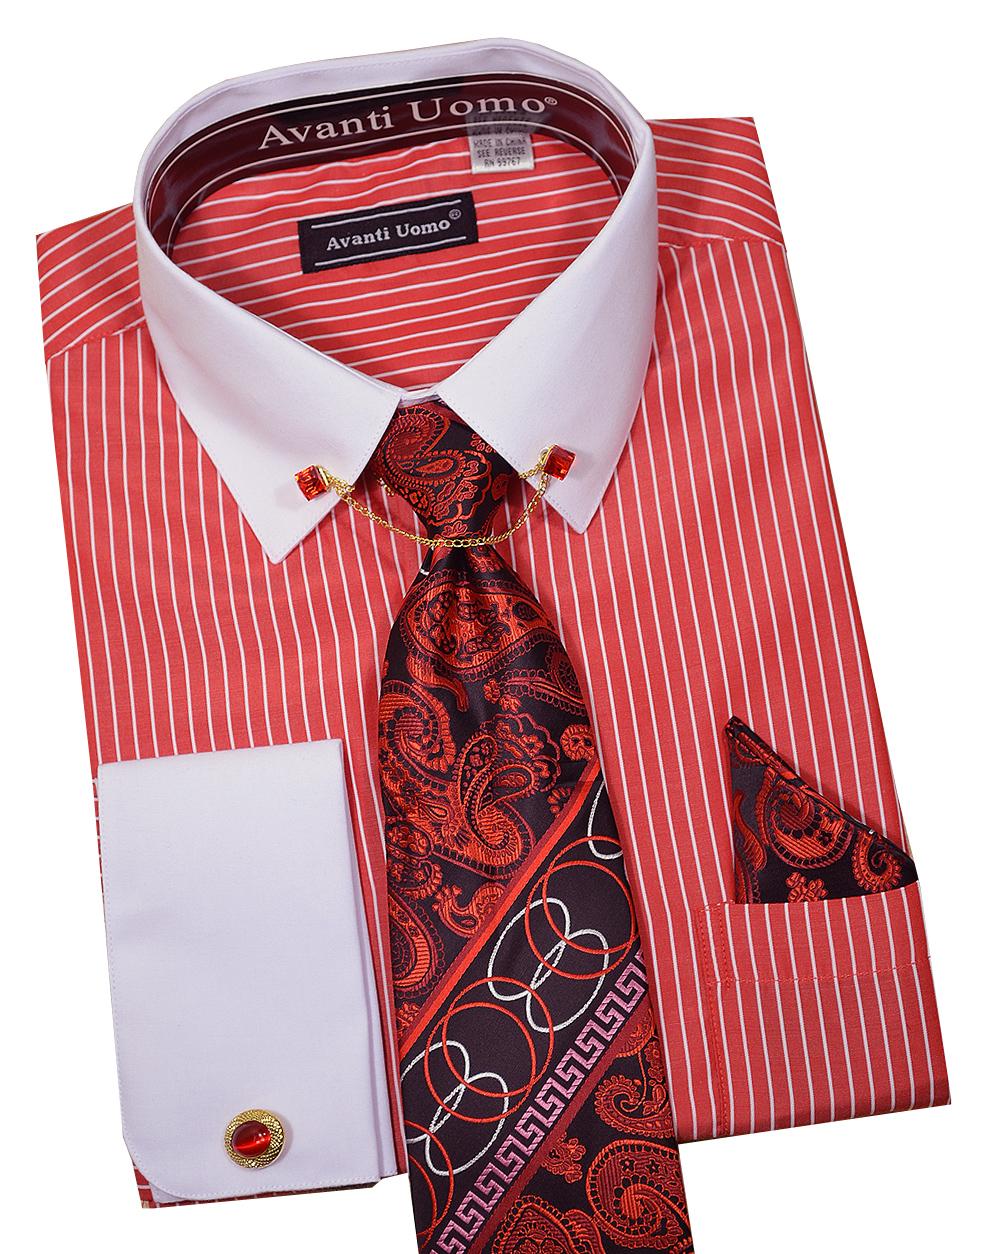 Avanti Uomo Red White Pinstripe Dress Shirt Tie